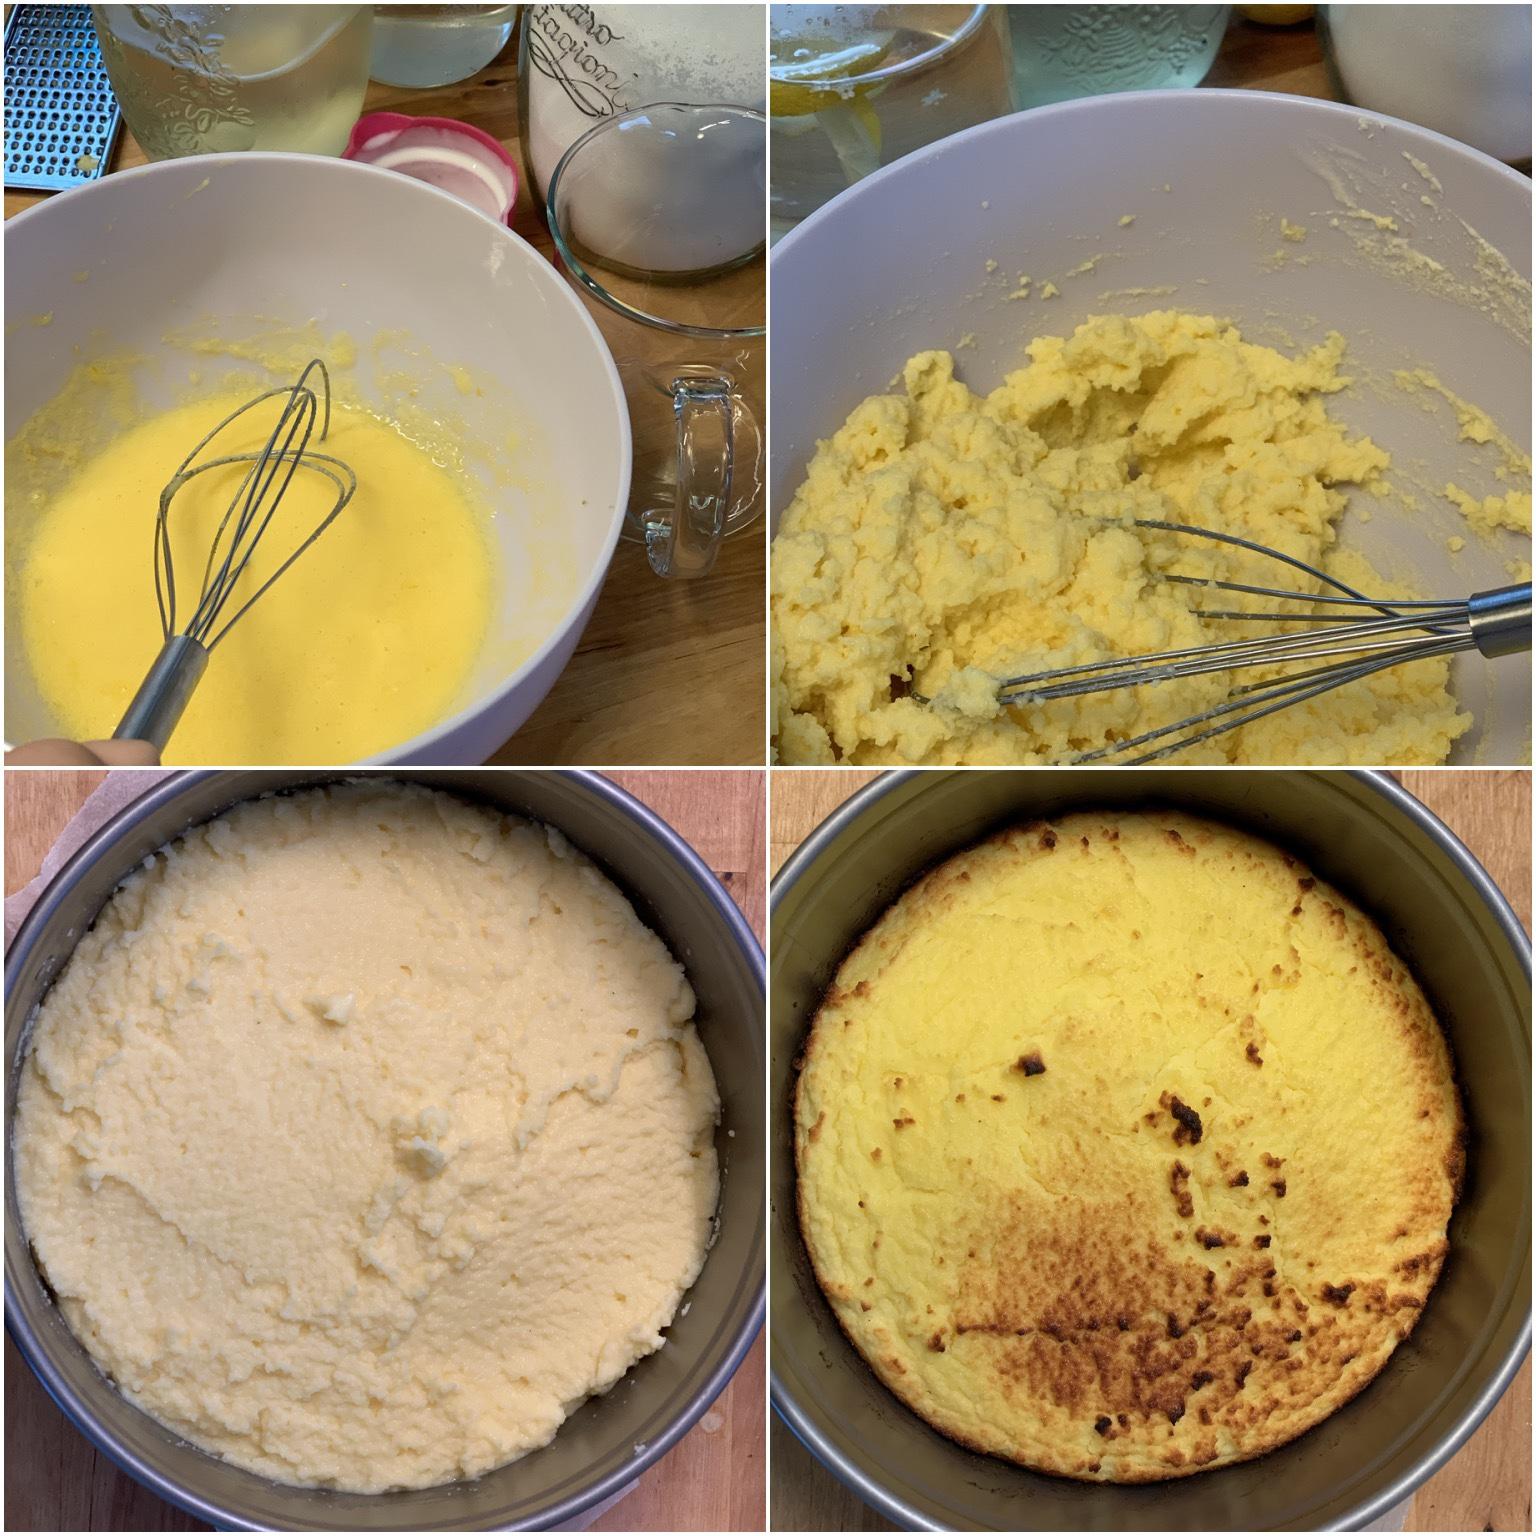 Picture of procedure to make elderflower cake